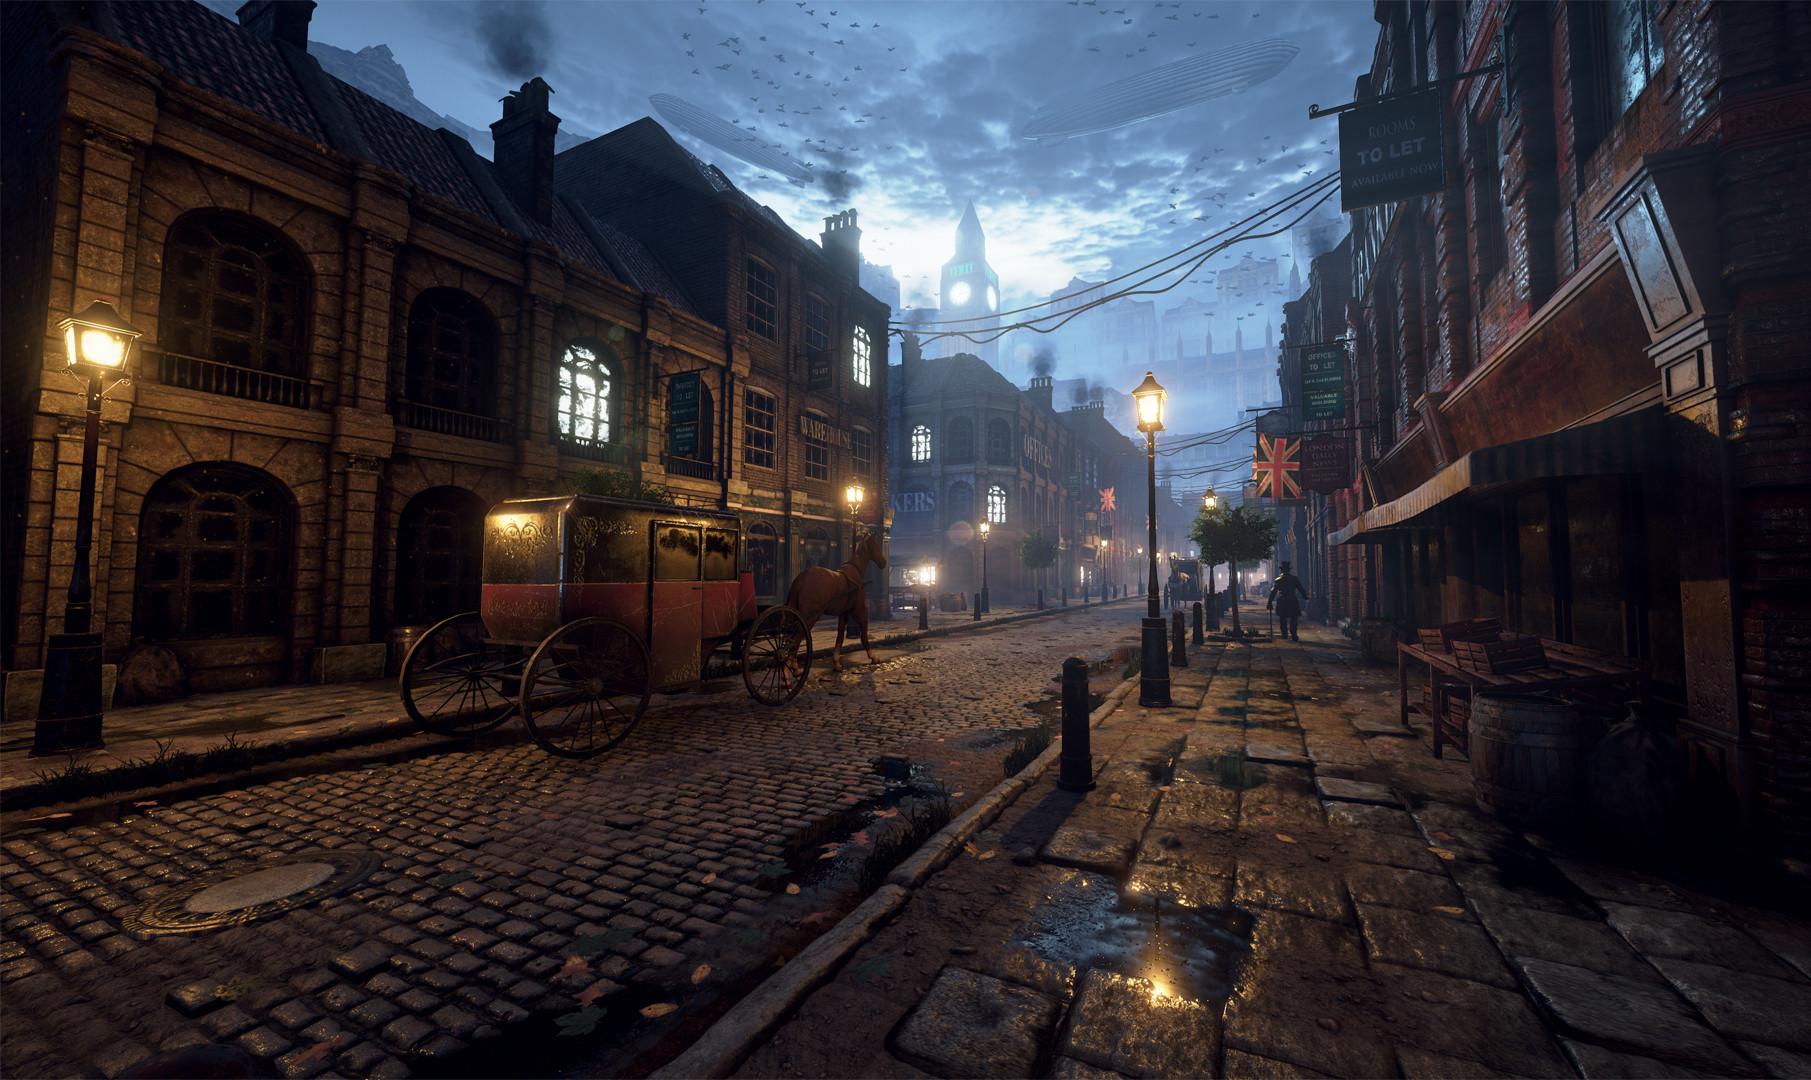 Michal Baca - Unreal Engine 4 - Victorian London Environment